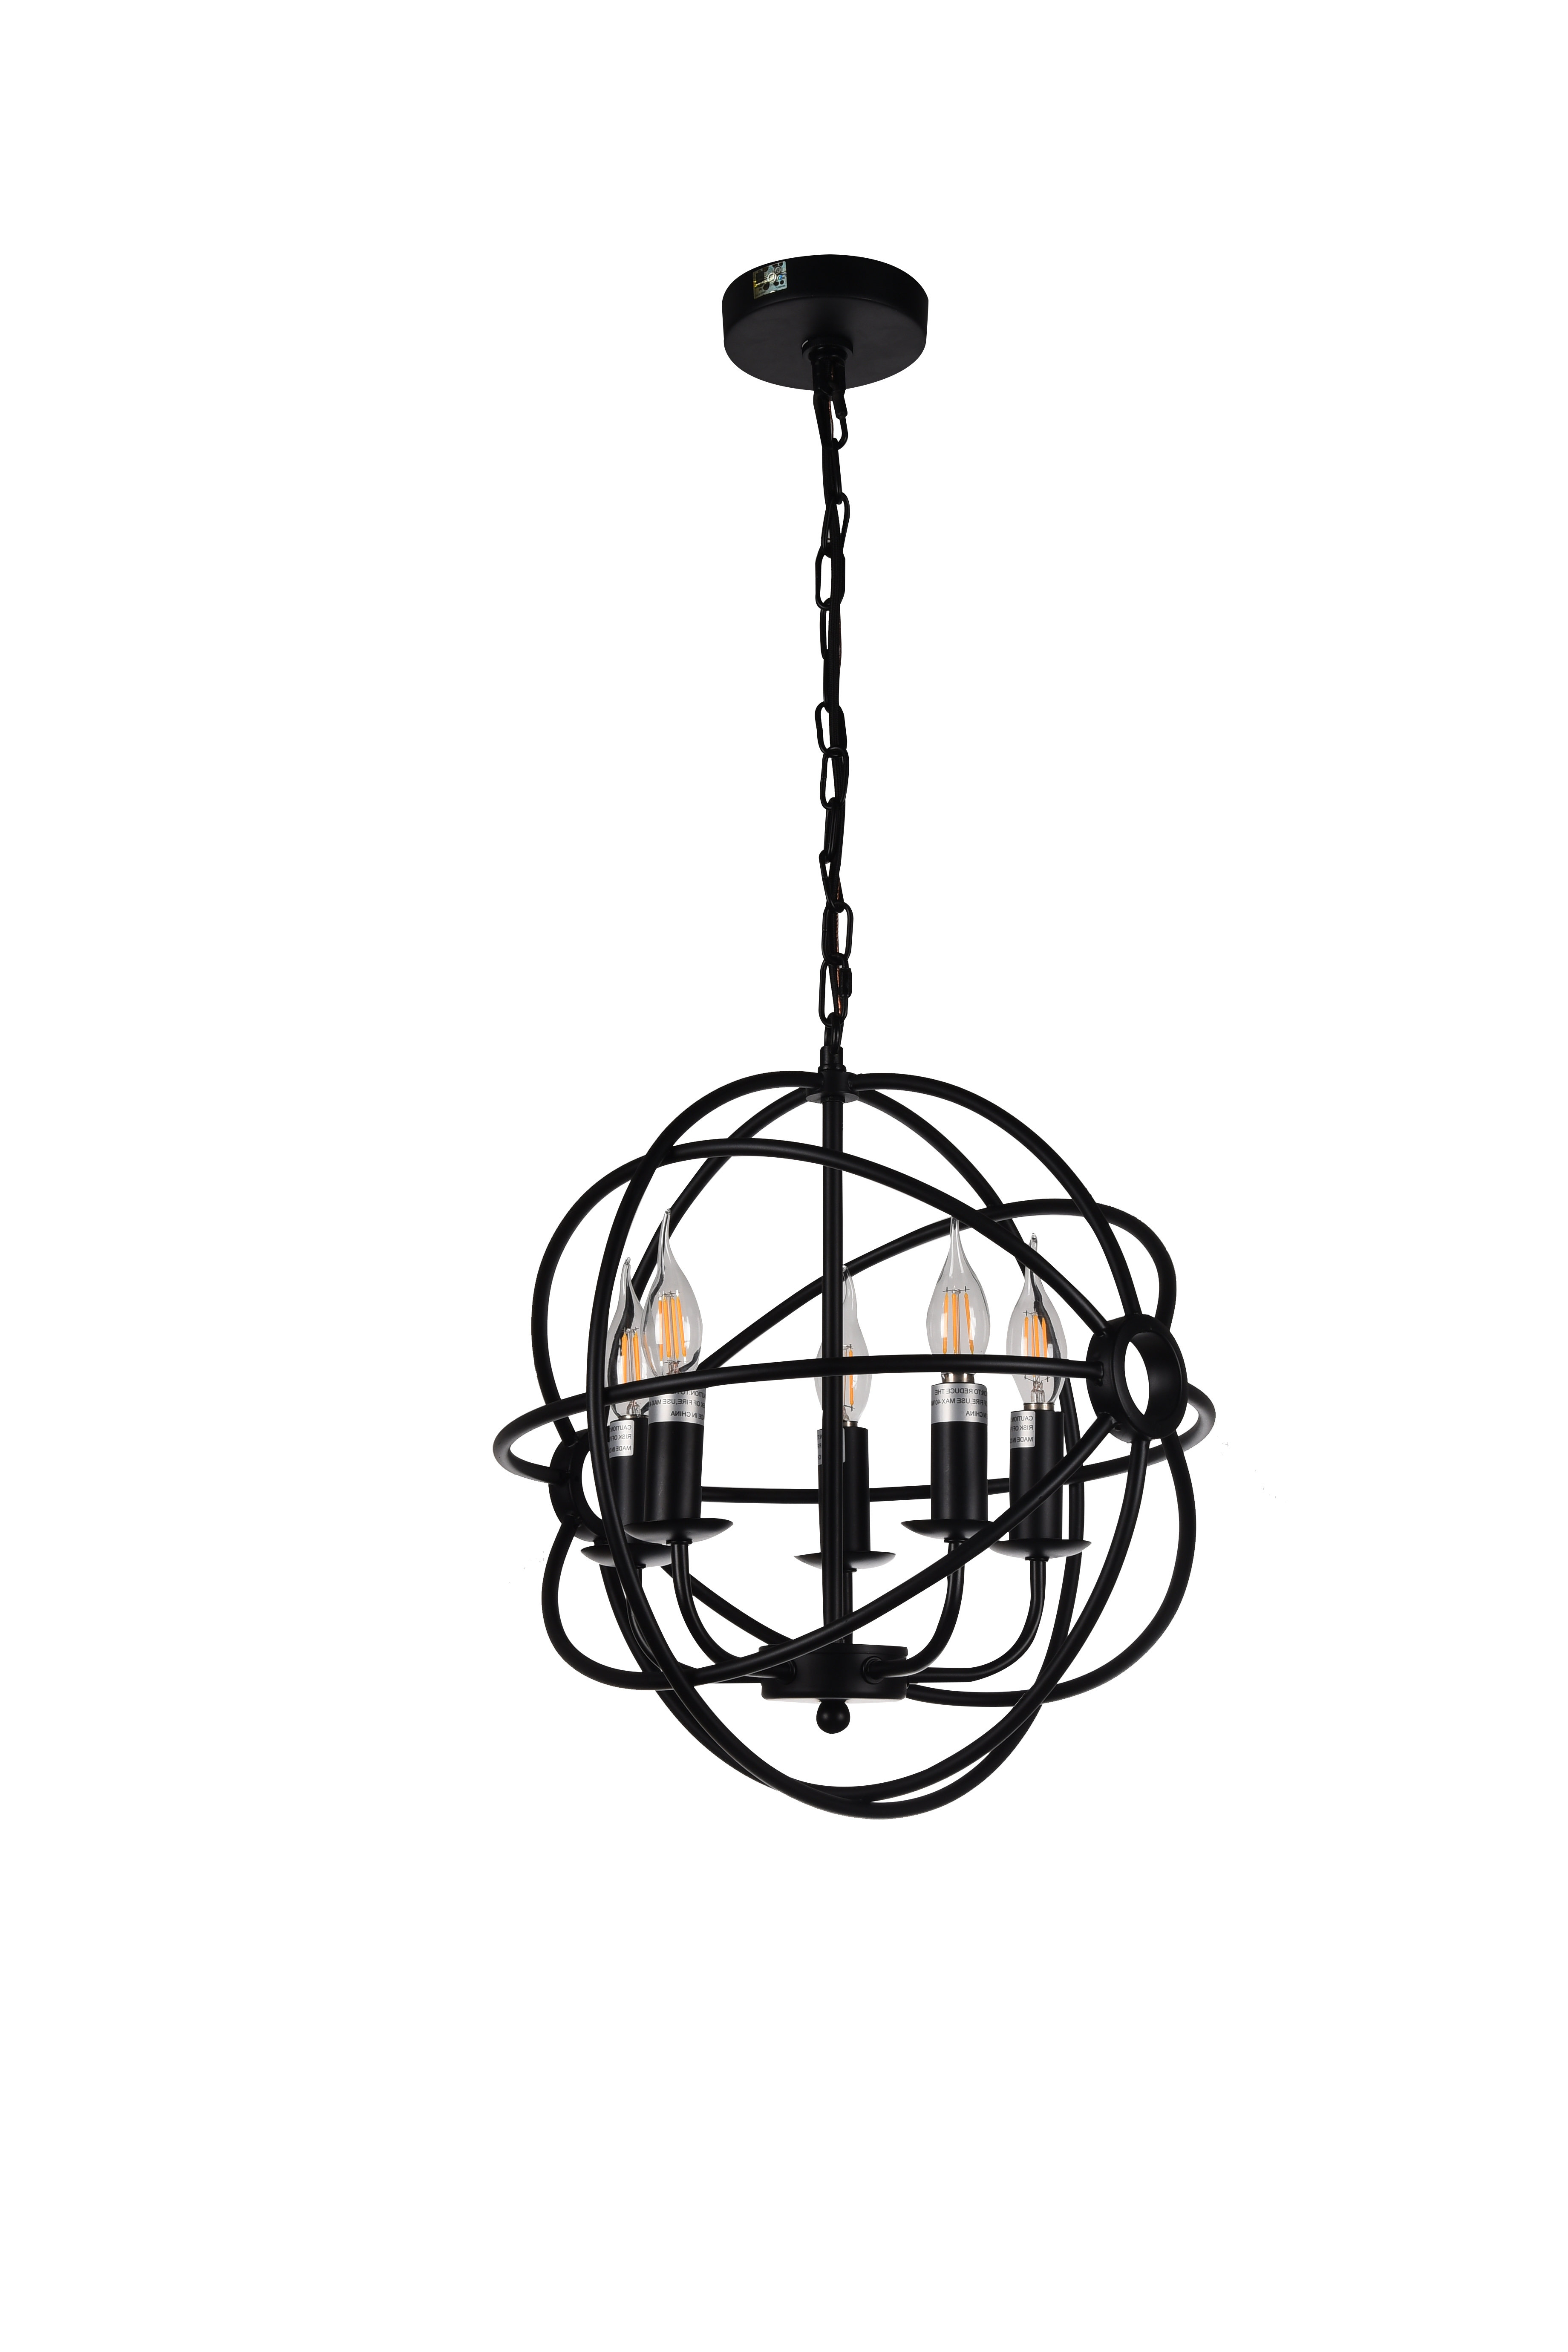 Famous Gaffney 5 Light Globe Chandelier Pertaining To Shipststour 3 Light Globe Chandeliers (View 15 of 25)